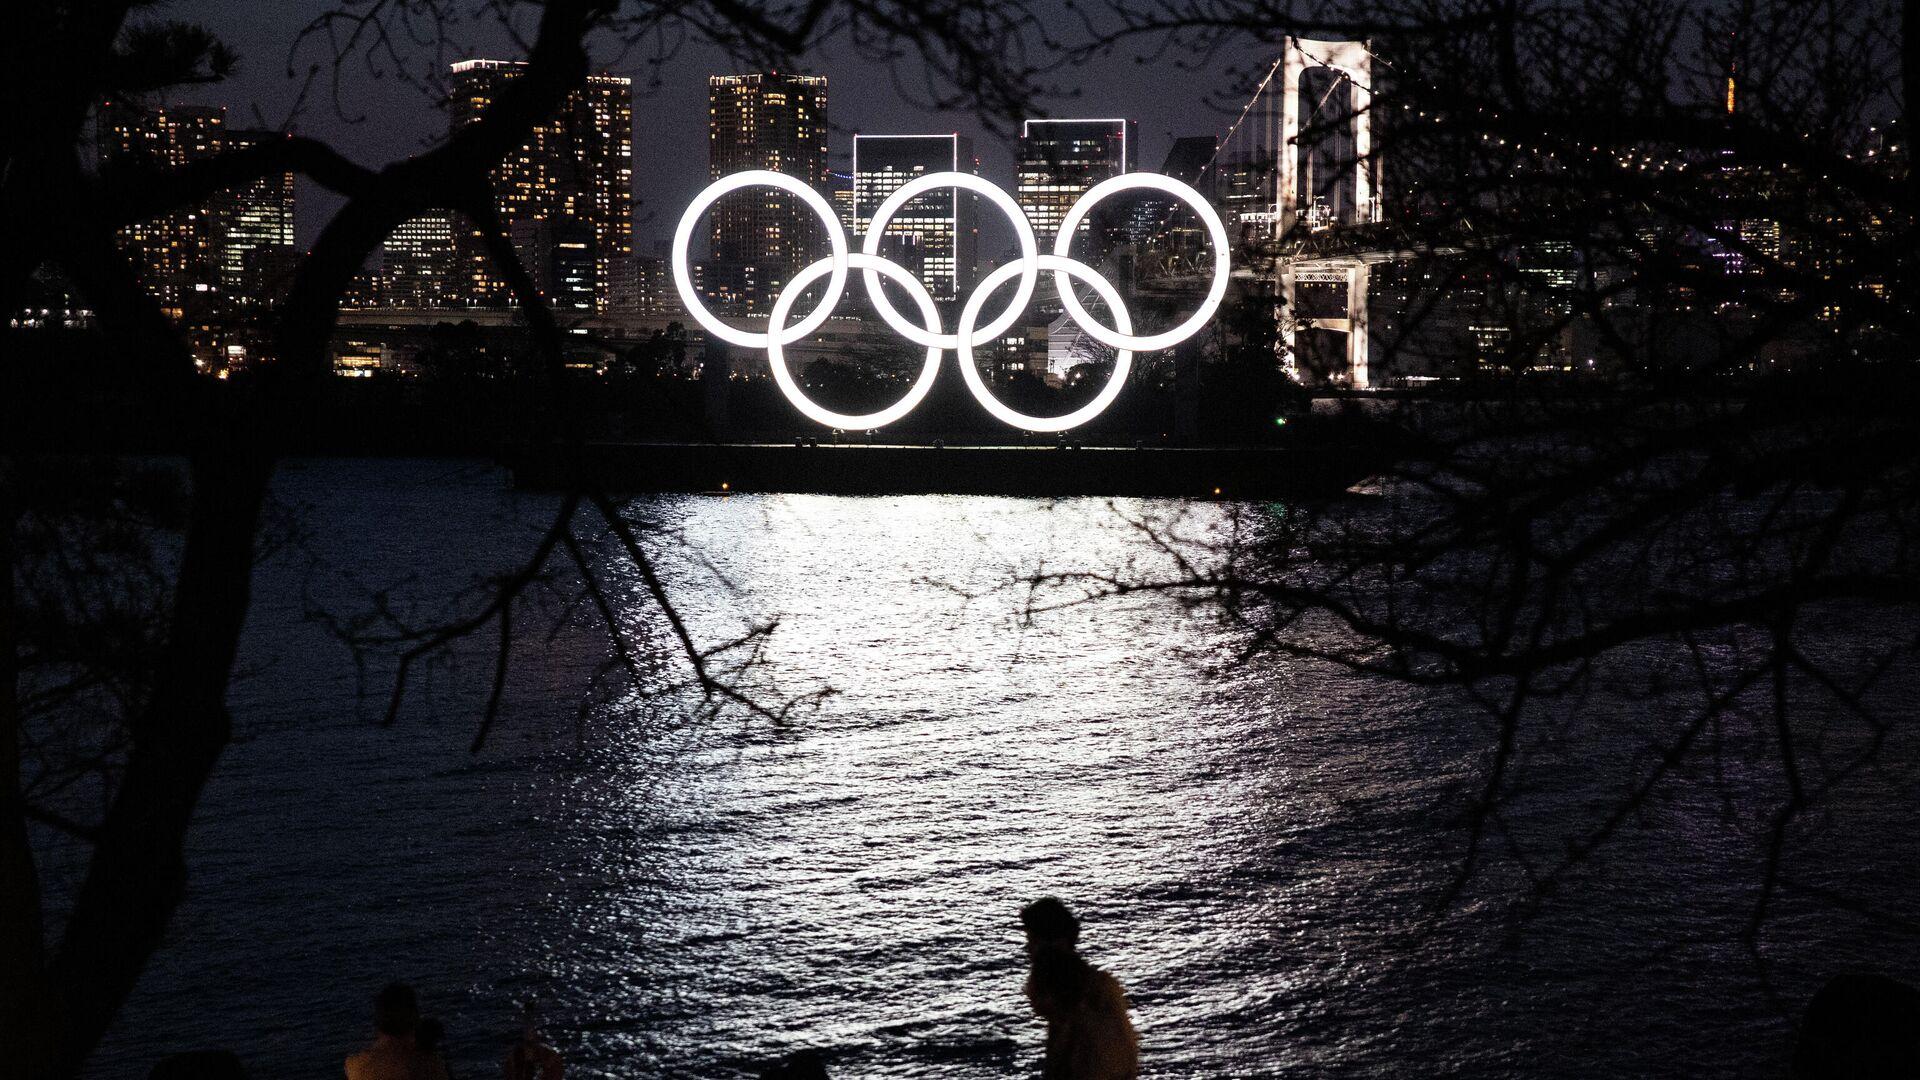 Олимпийские кольца в Токио - РИА Новости, 1920, 22.07.2021